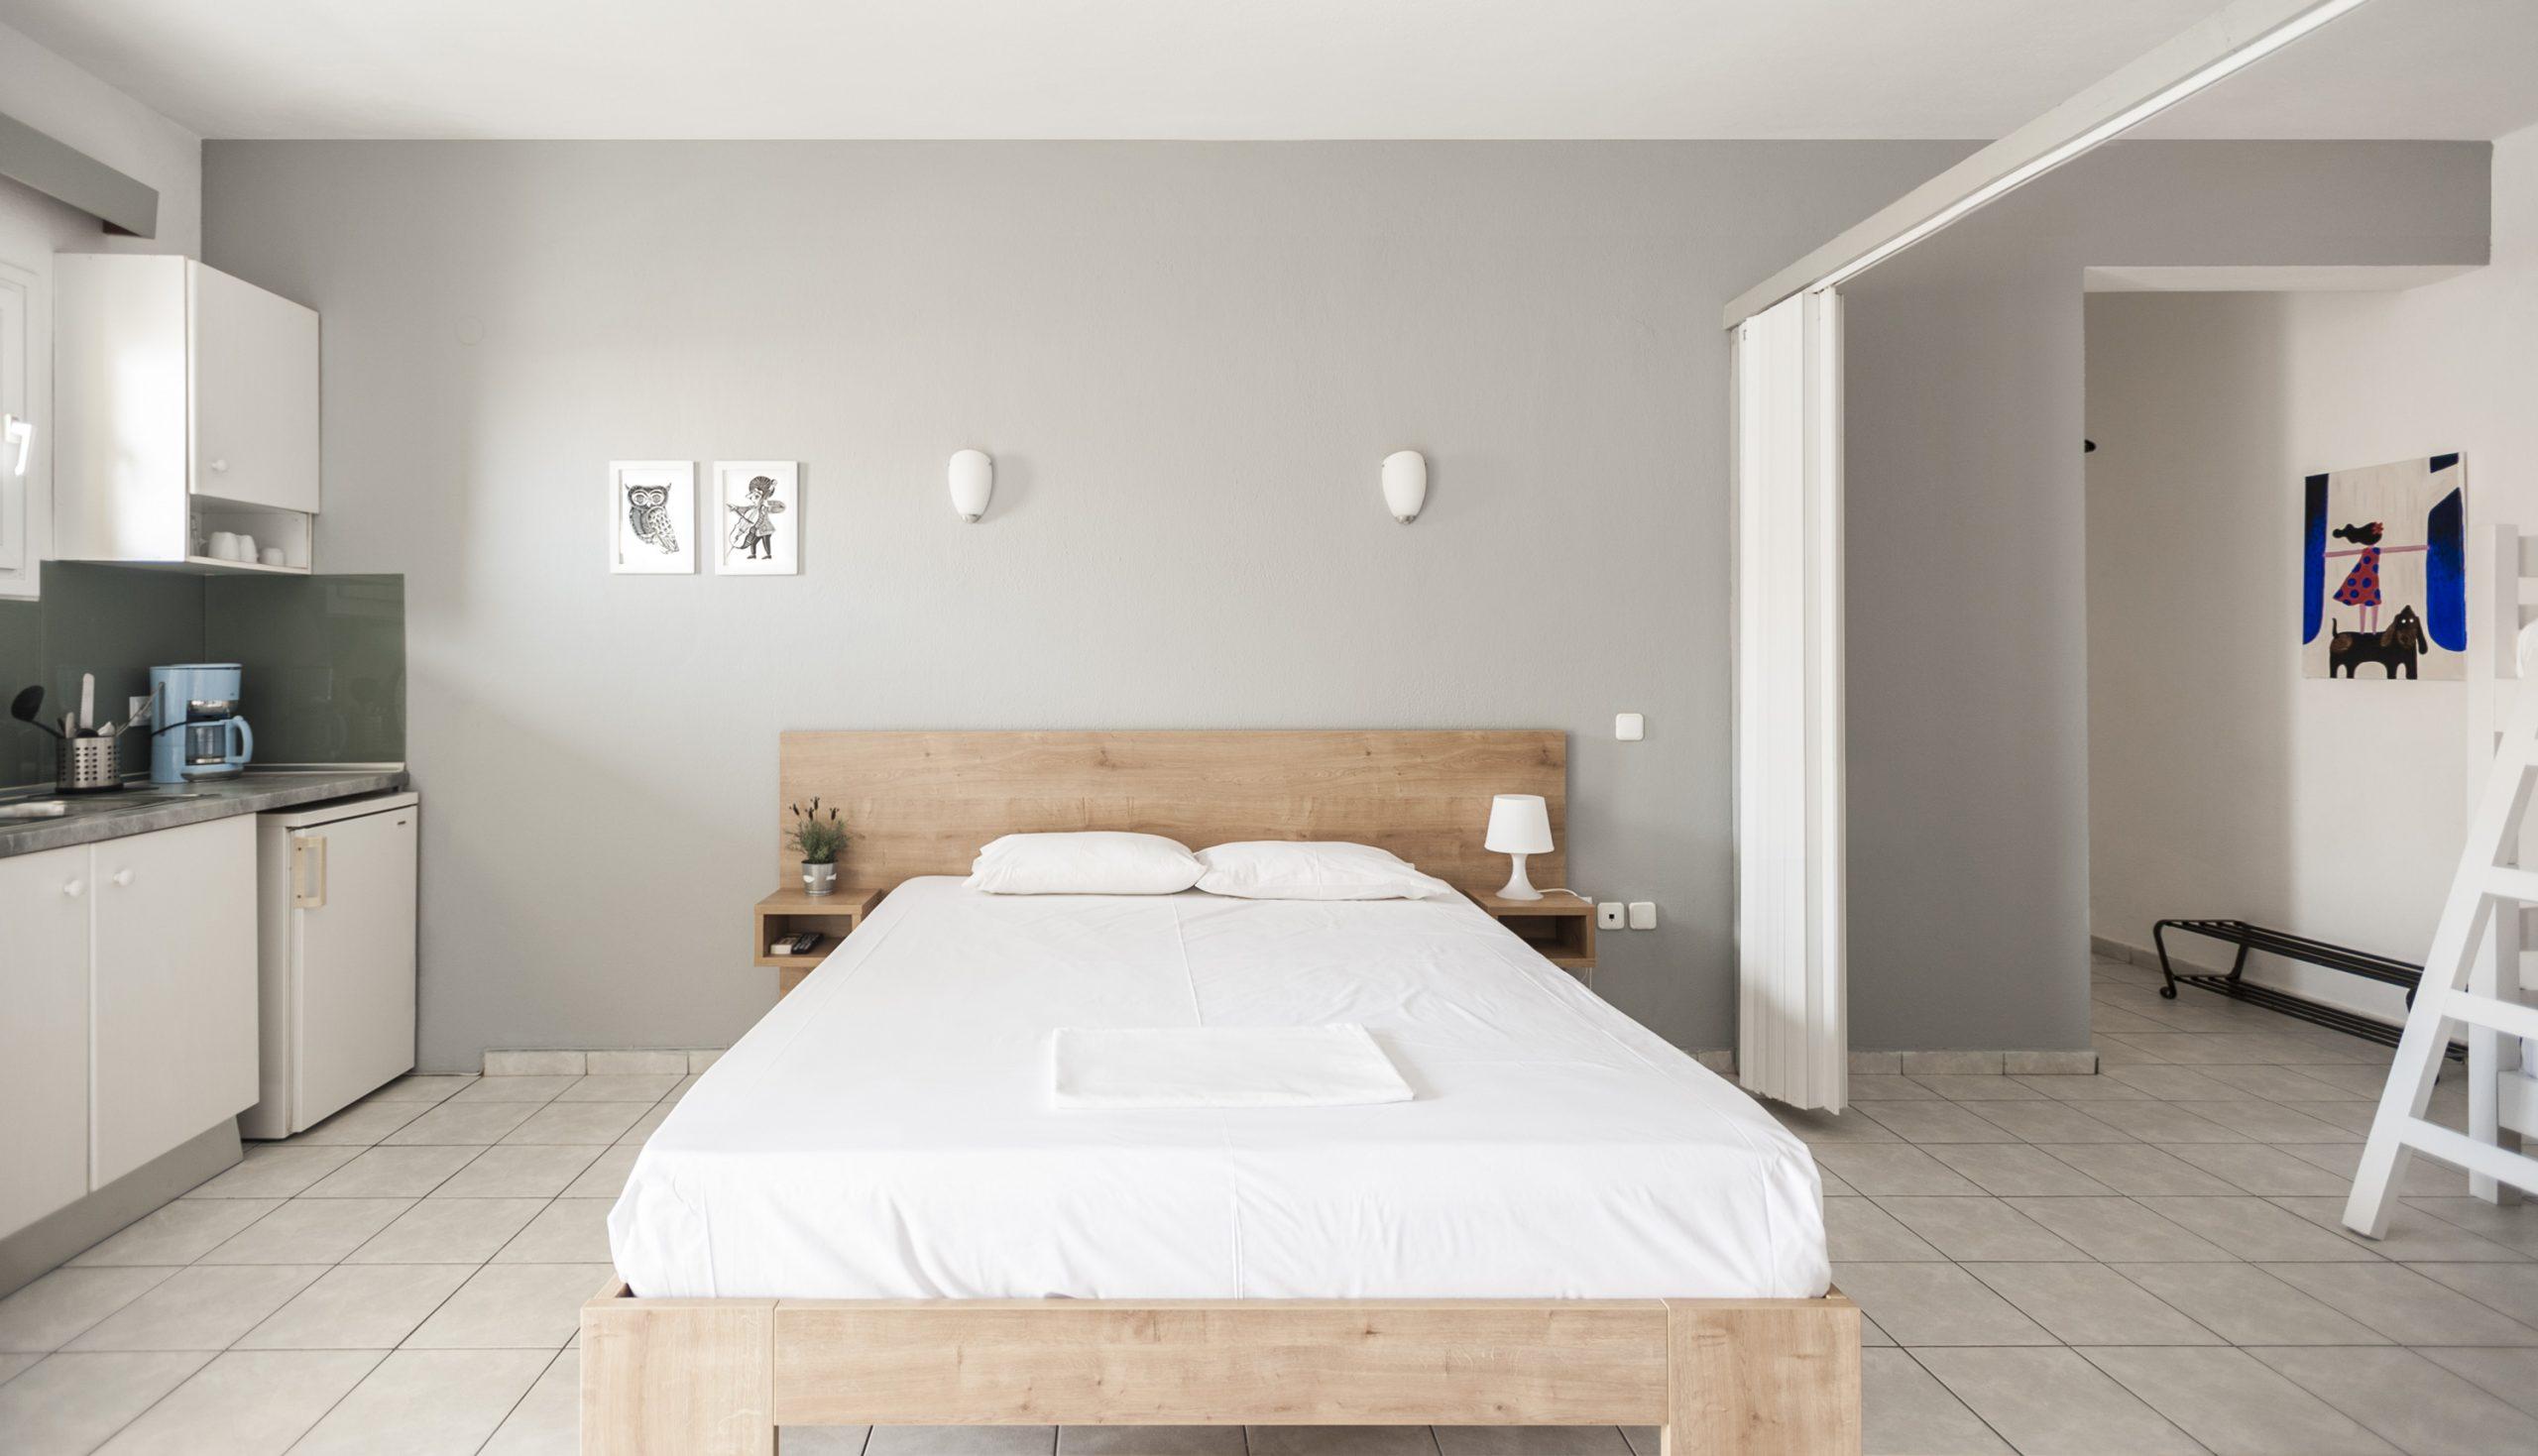 Afkos_rooms_006